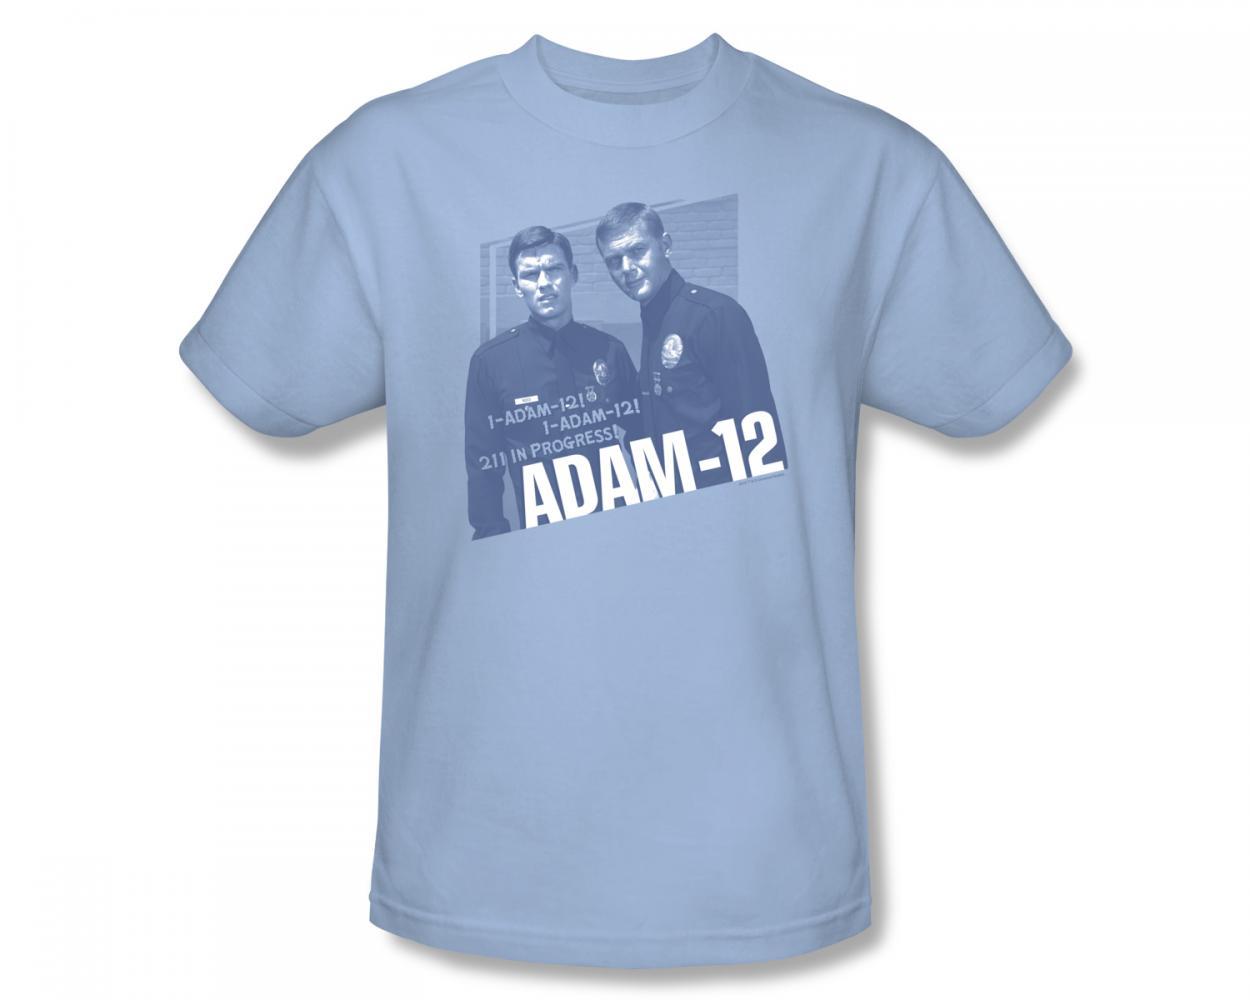 Image of Adam-12 - Radio Call Slim Fit Adult T-Shirt In Light Blue